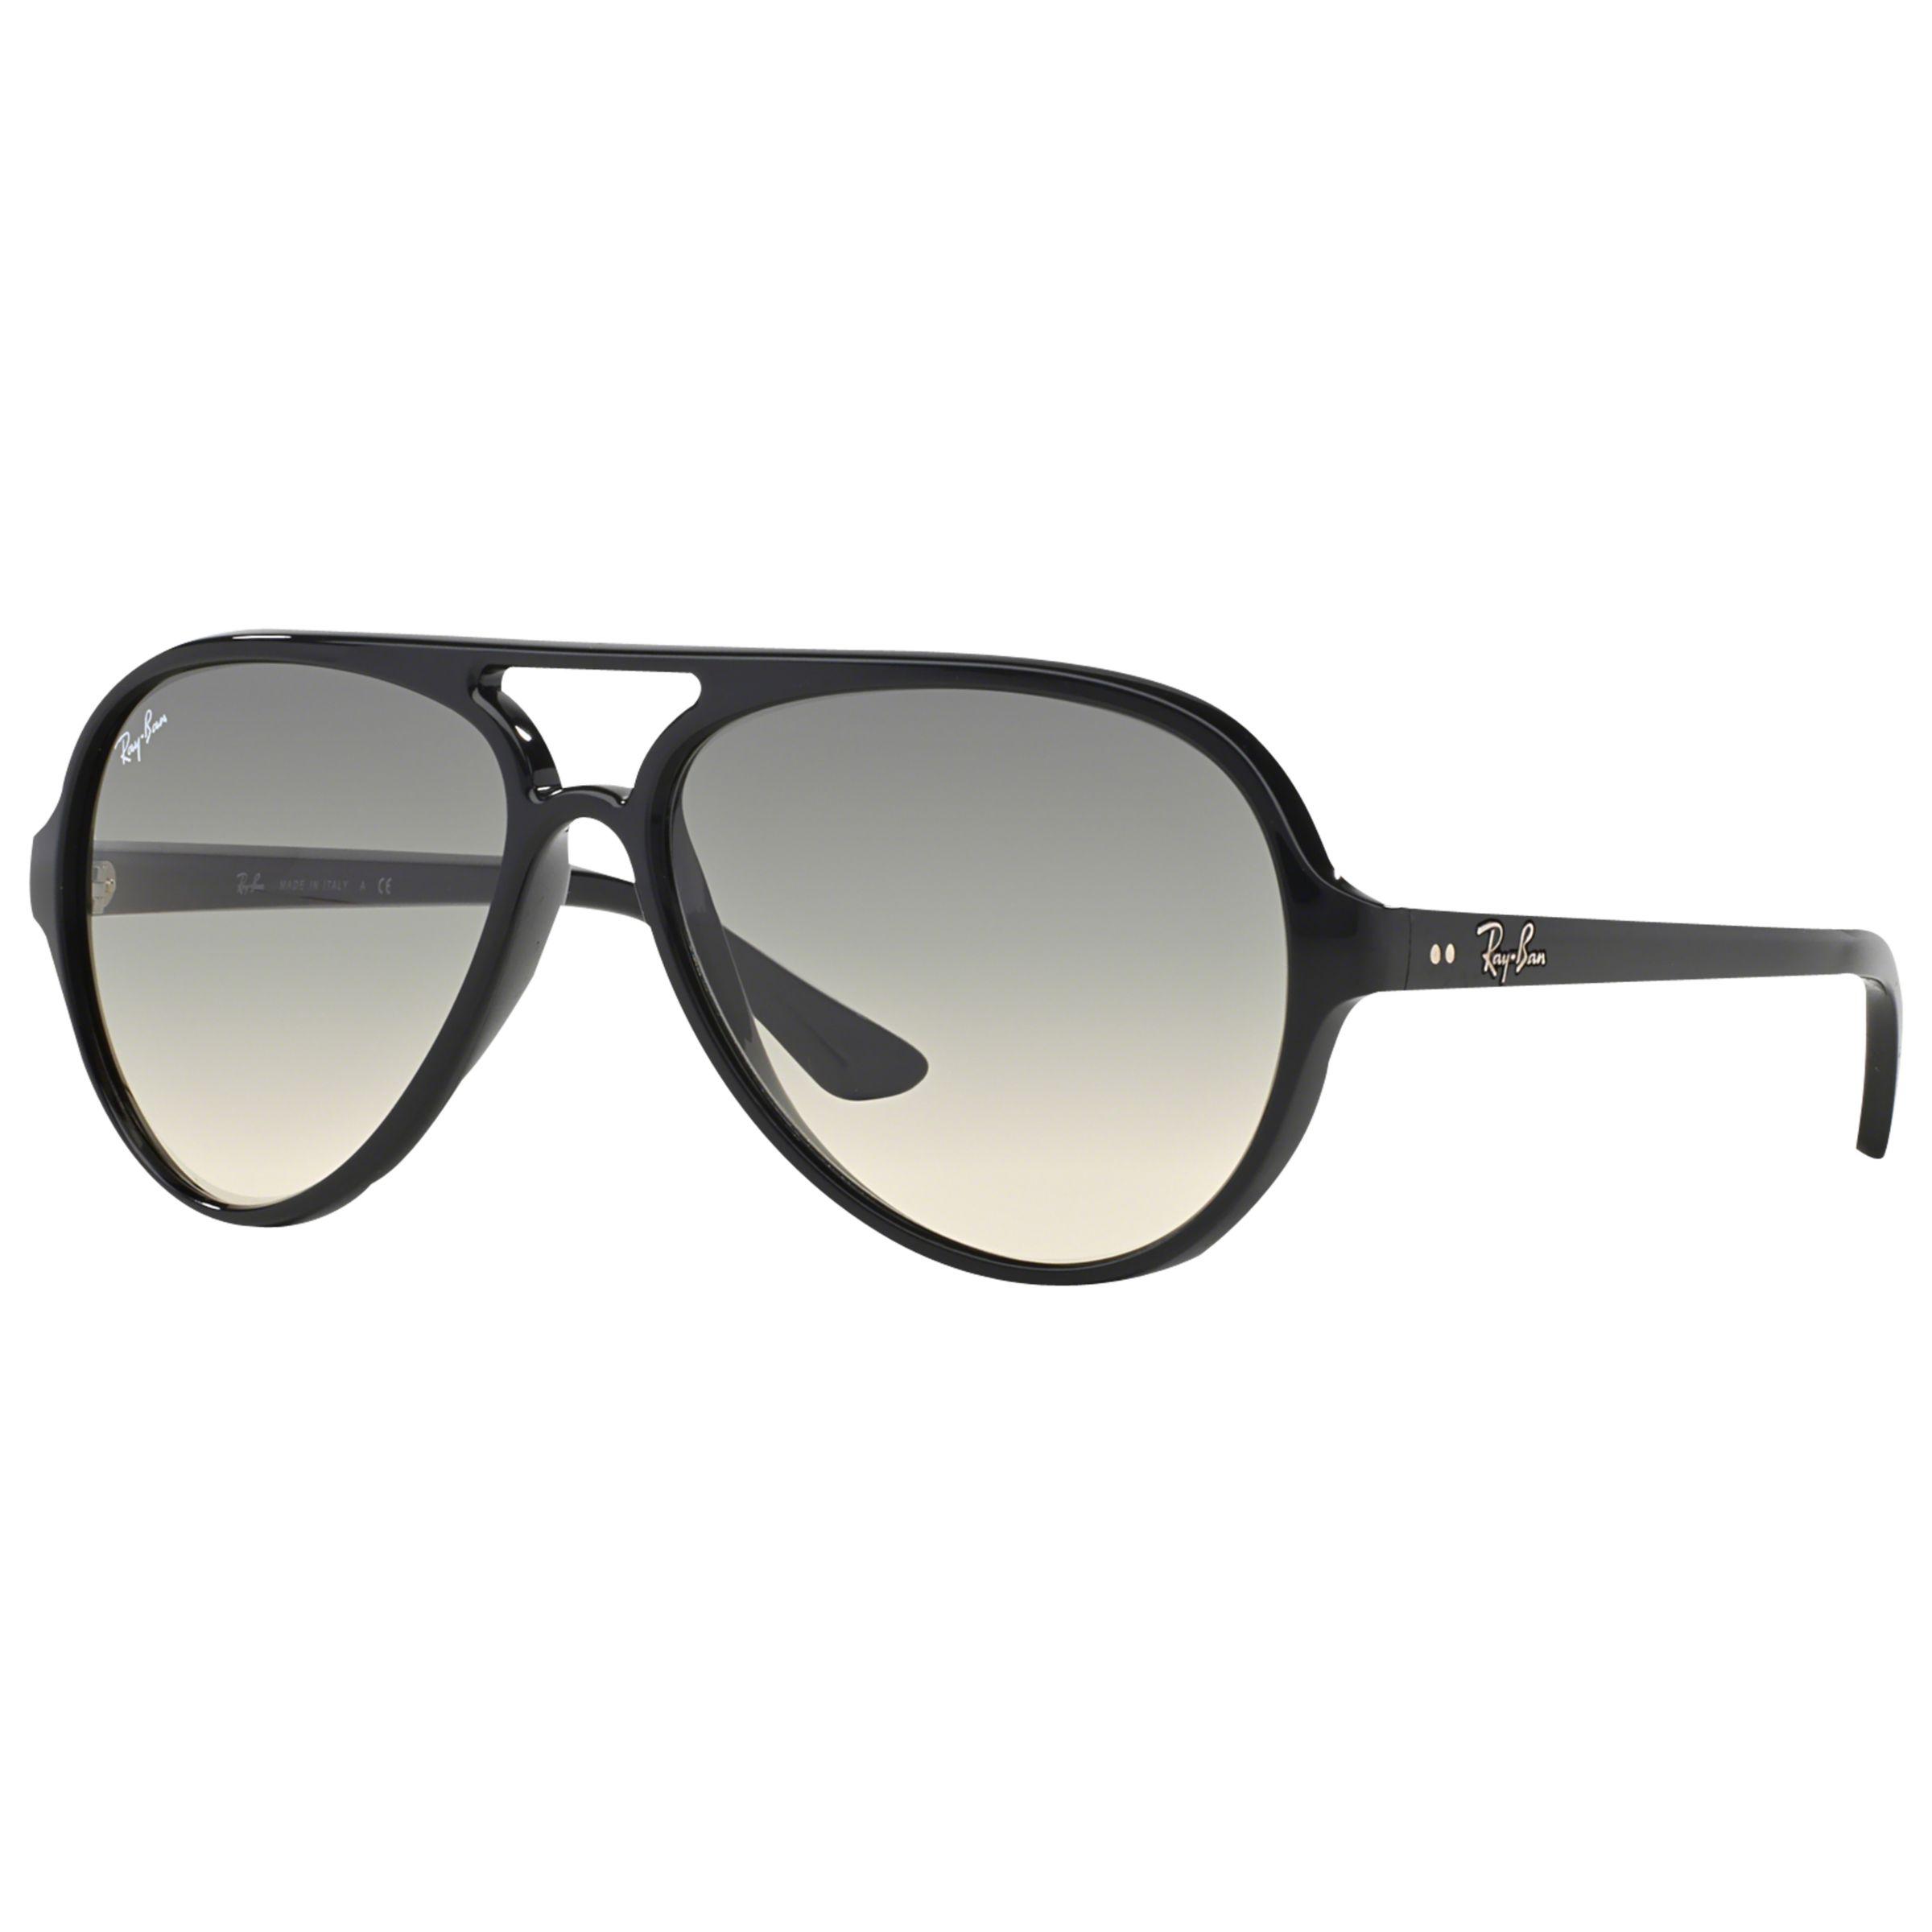 3b792043c2 Ray-Ban RB4125 Cats 5000 Aviator Sunglasses